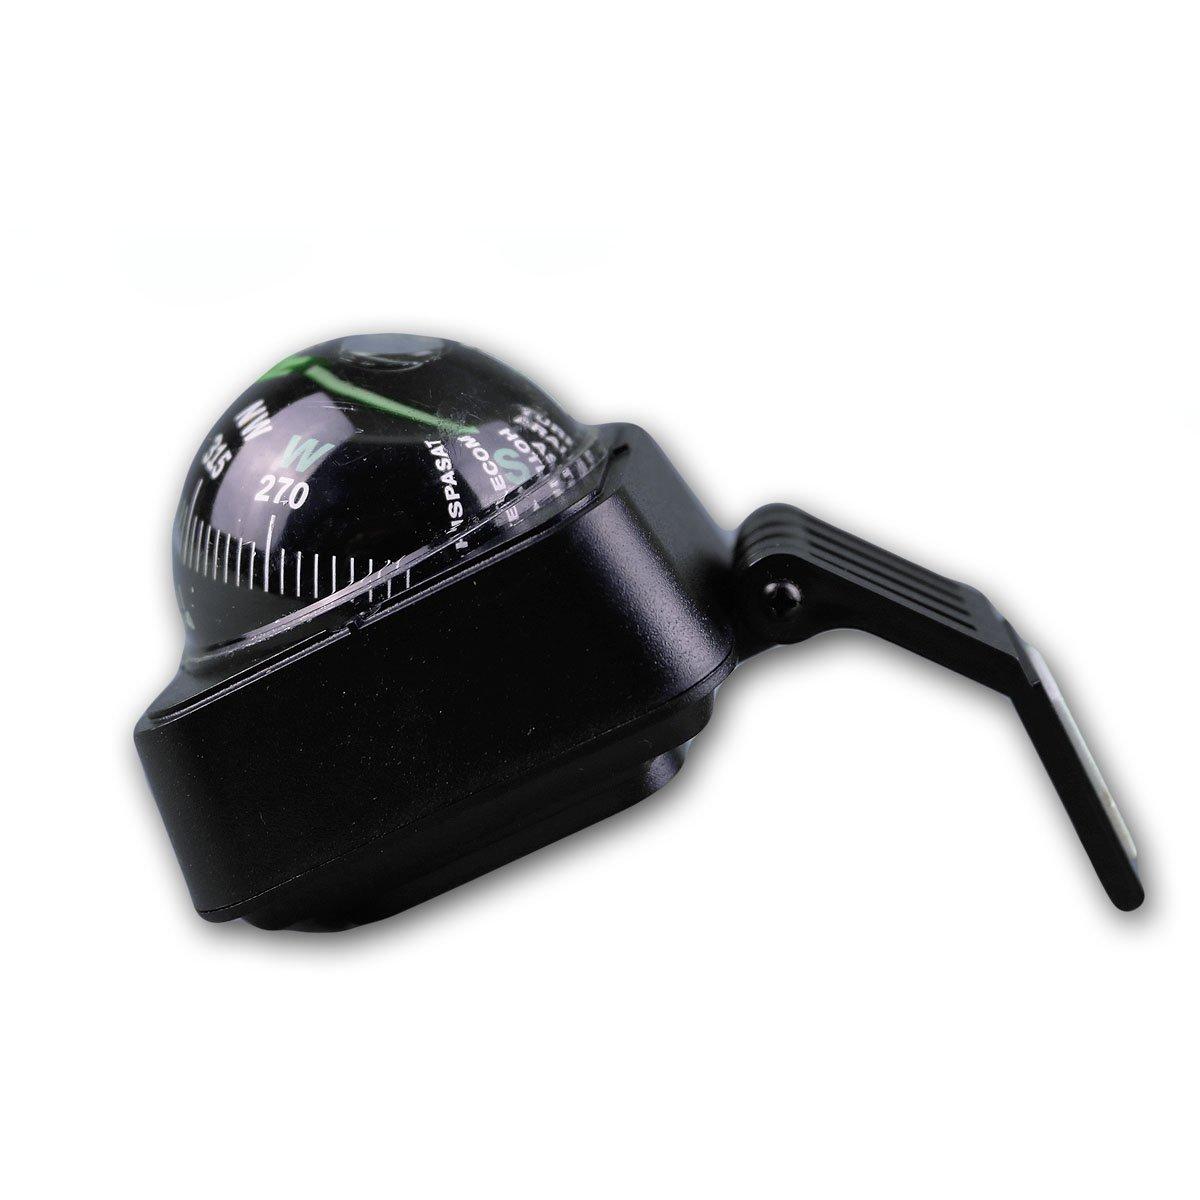 sat kompass kugelkompass 6 satelliten ausrichthilfe sat. Black Bedroom Furniture Sets. Home Design Ideas